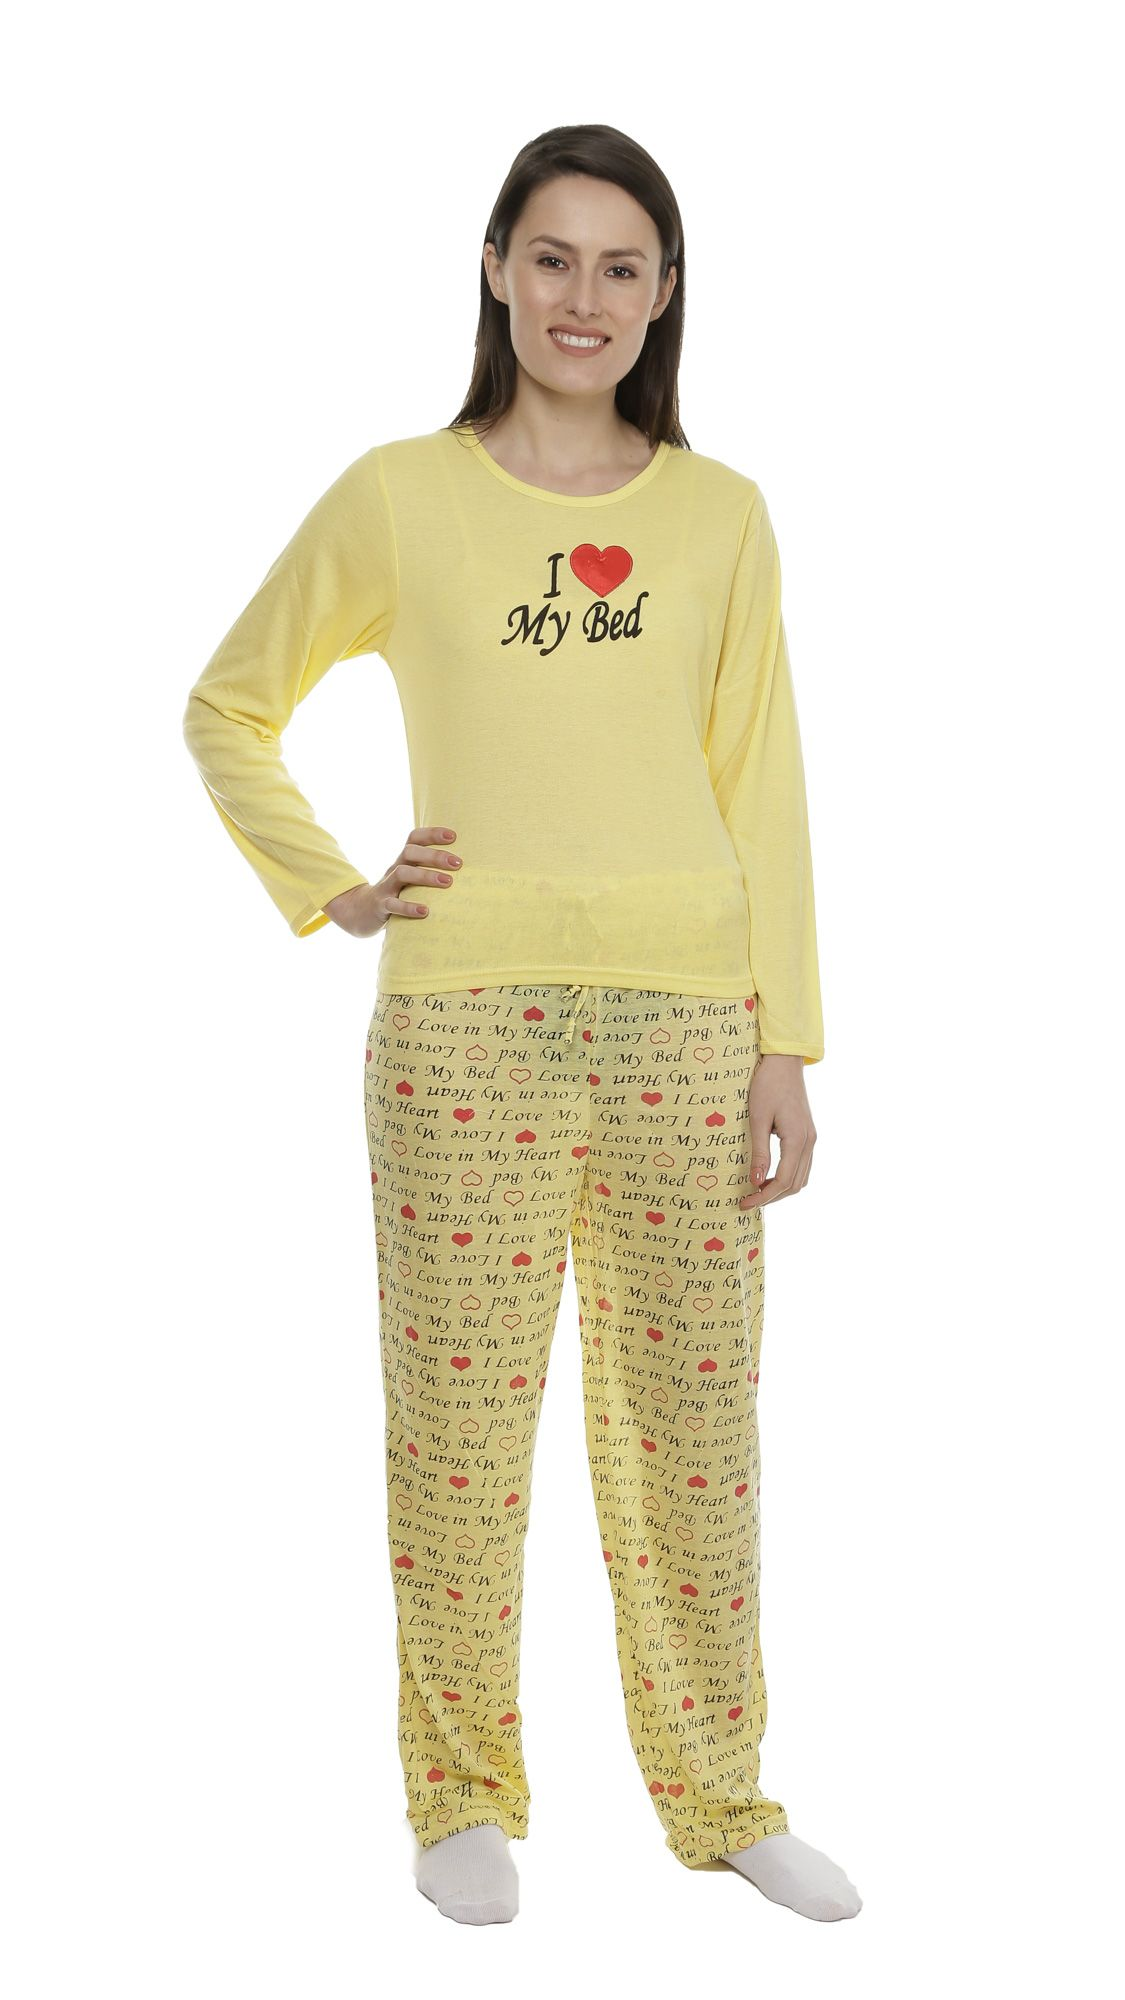 comforter shirt set soft t itm comfortable women maternity zexxy pajamas pants ultra nursing sleepwear